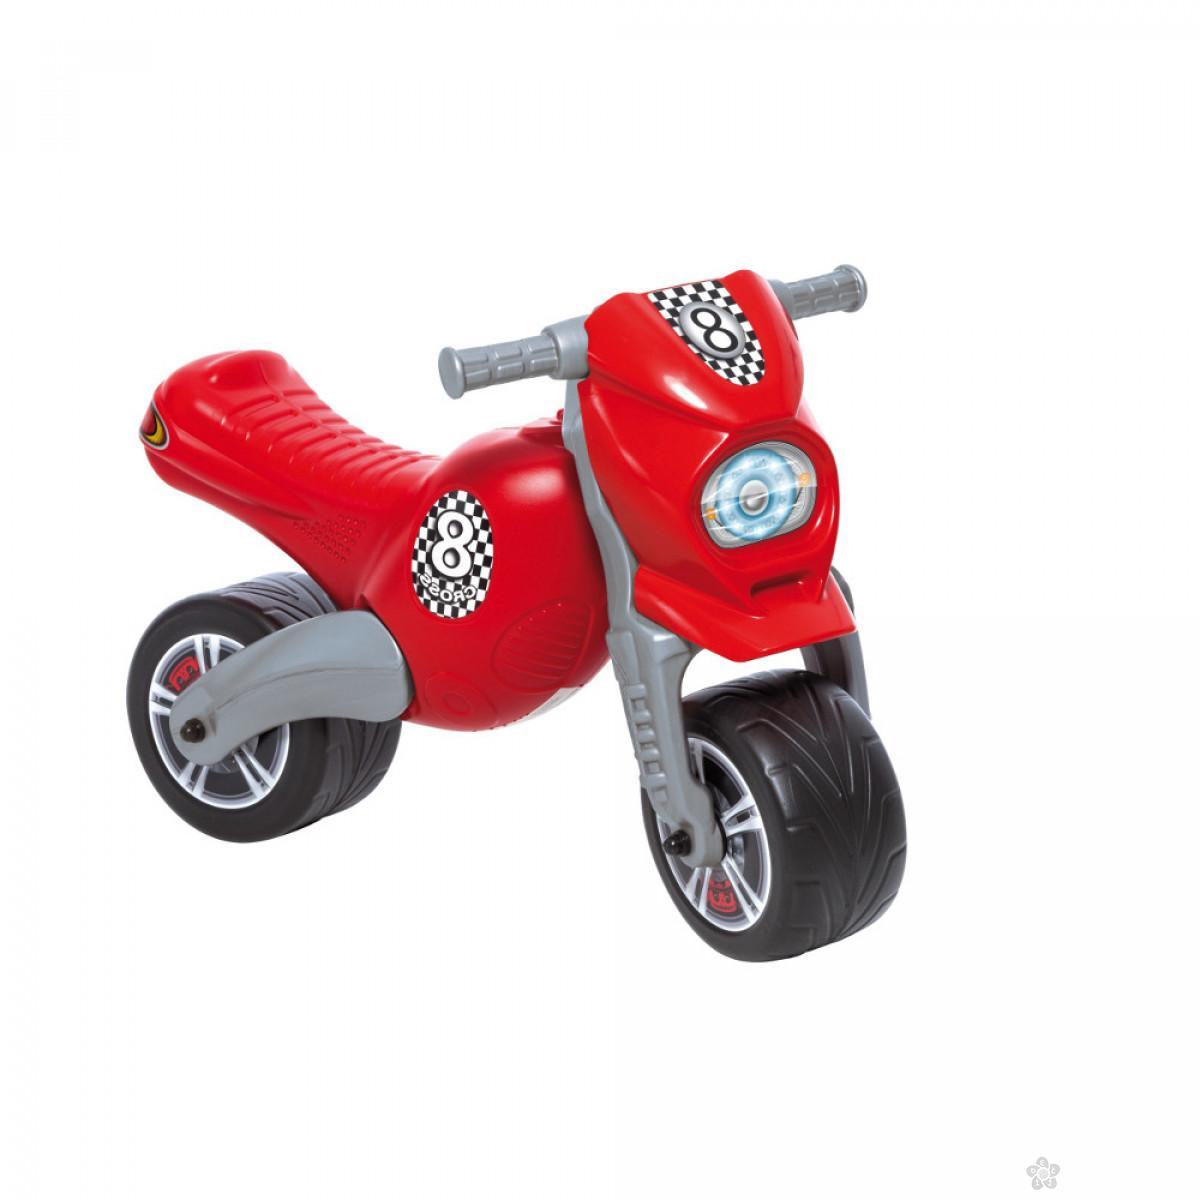 Dečija guralica Cross 8 Motor Bike crvena